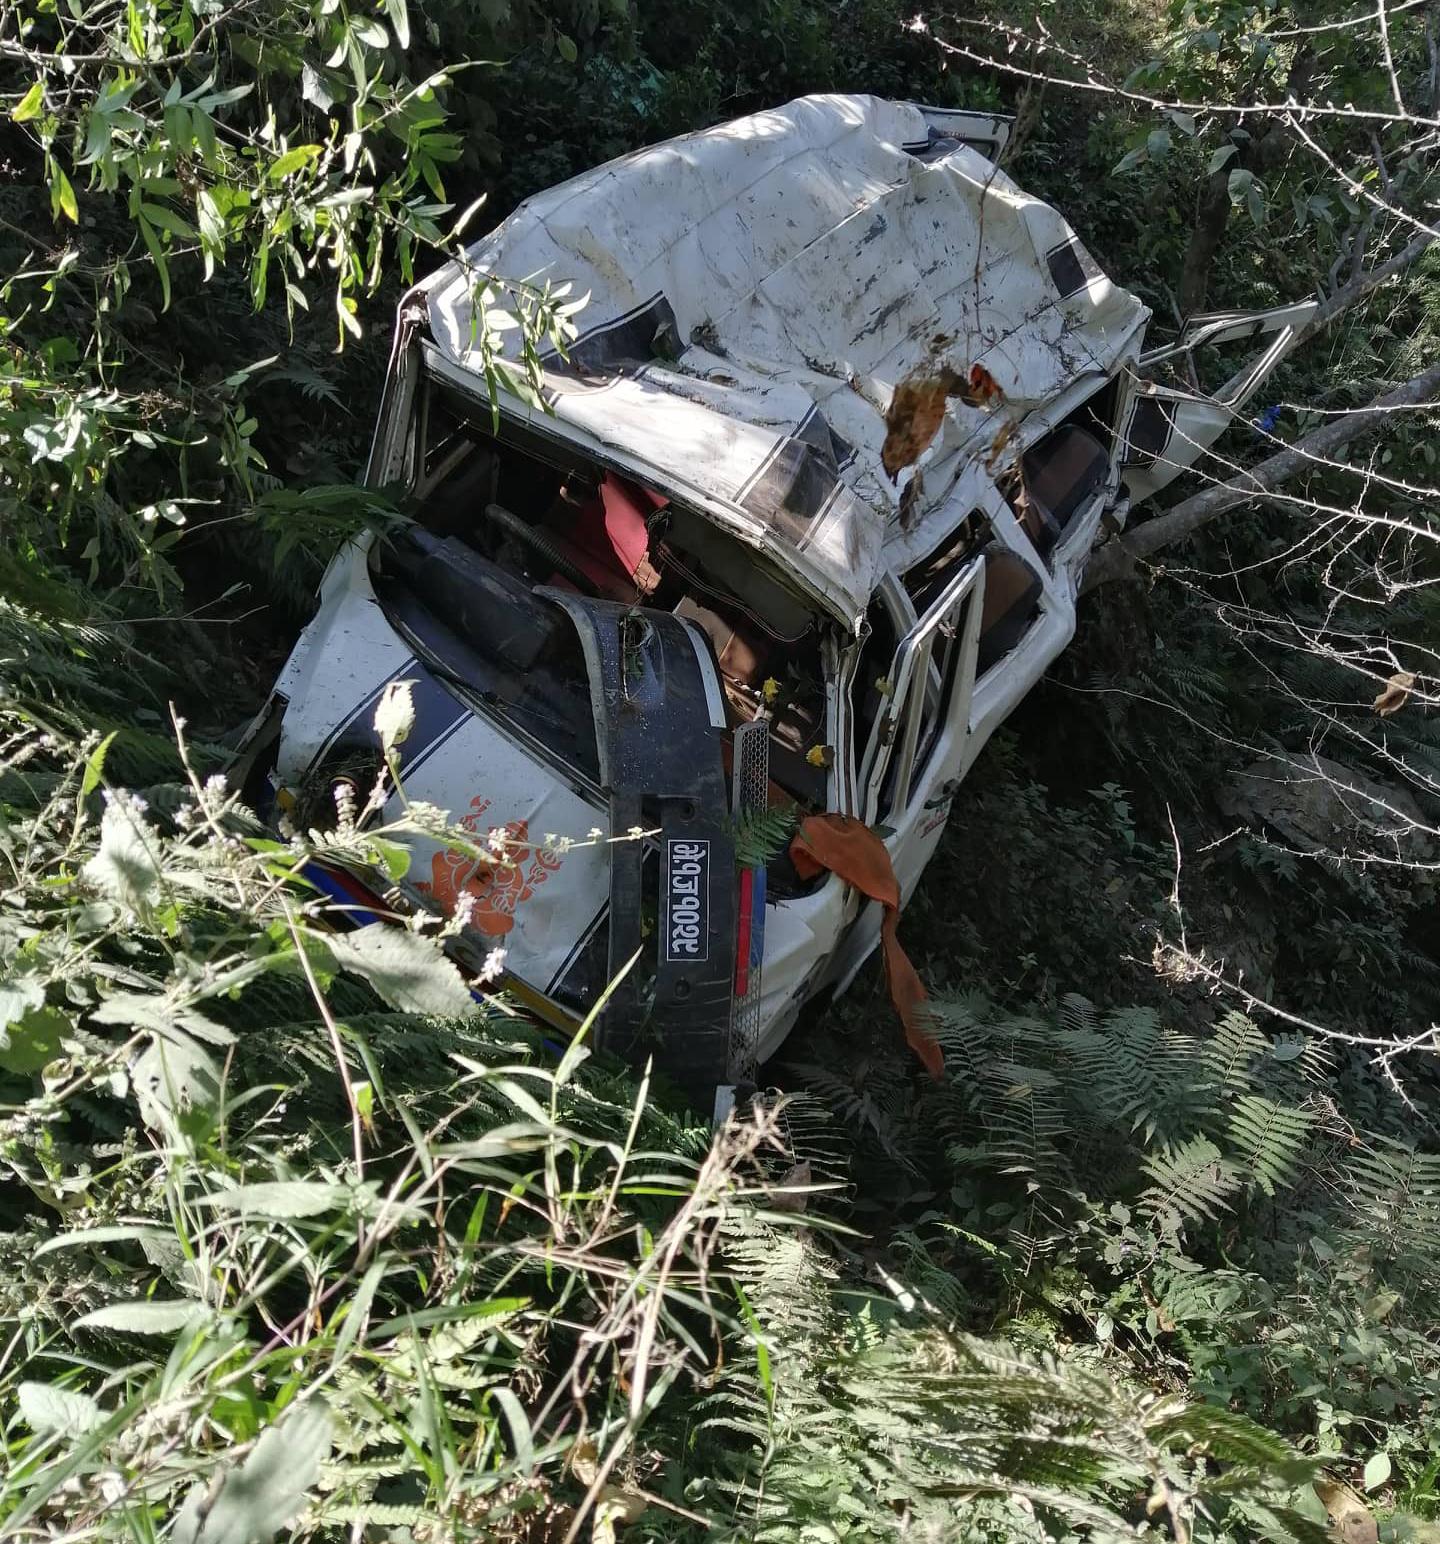 अपडेड : दैलेखमा हाईस दुर्घटना ३ को मृत्यु १५ घाईते